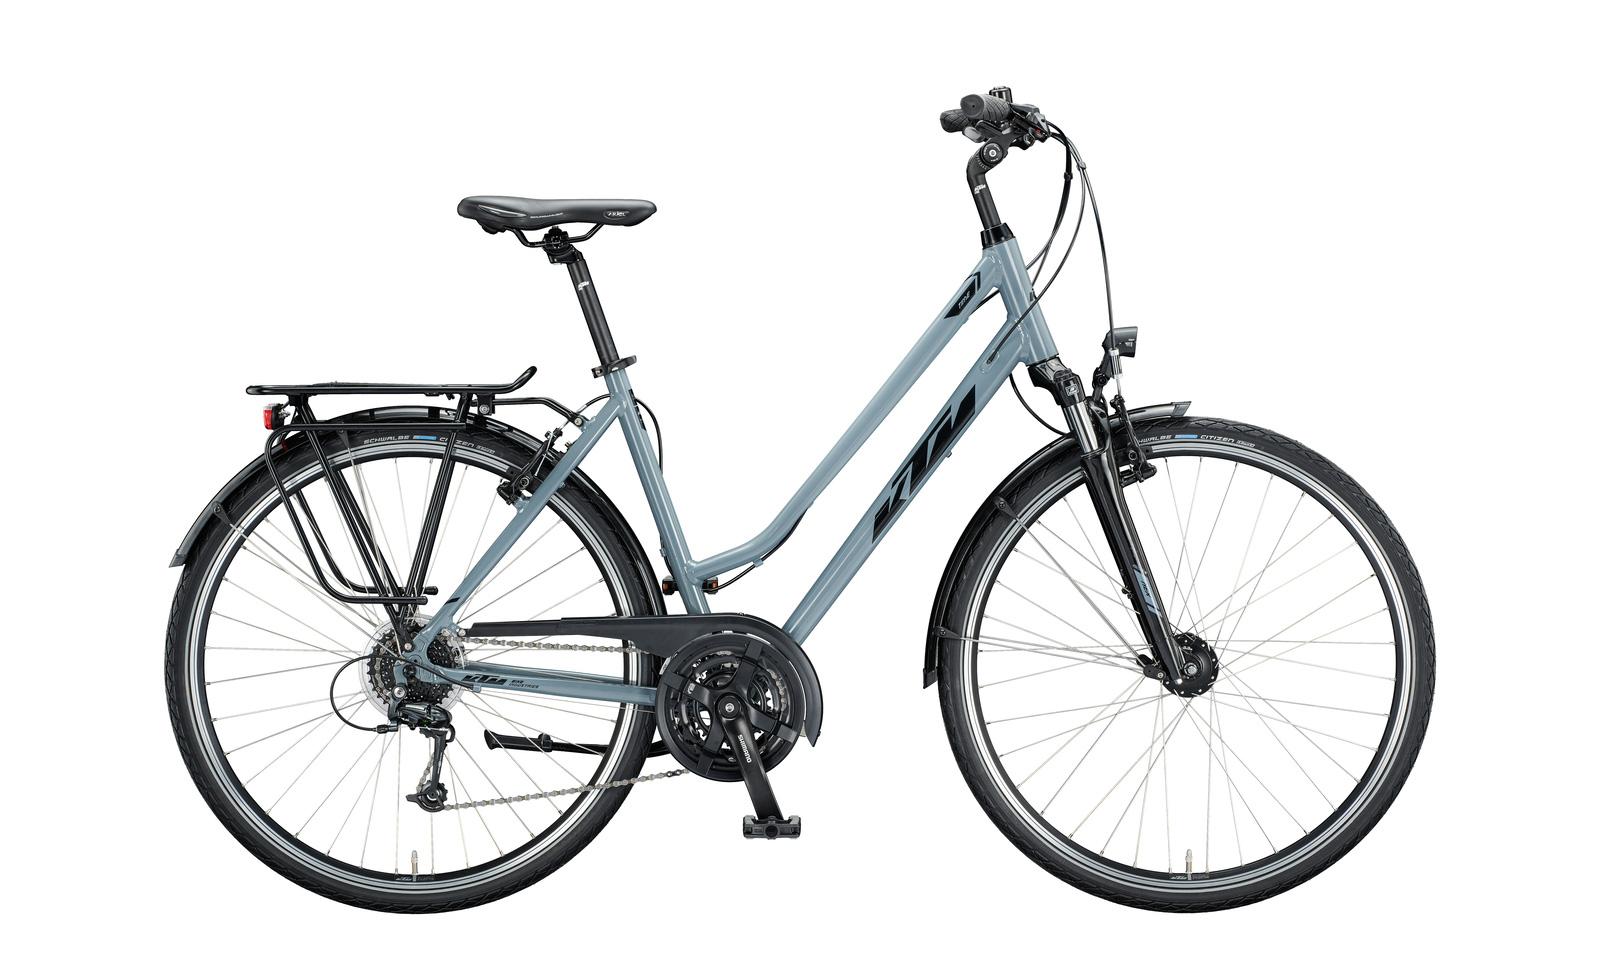 Biciclete KTM Trekking Onroad LIFE TIME 3x8 Shimano Deore